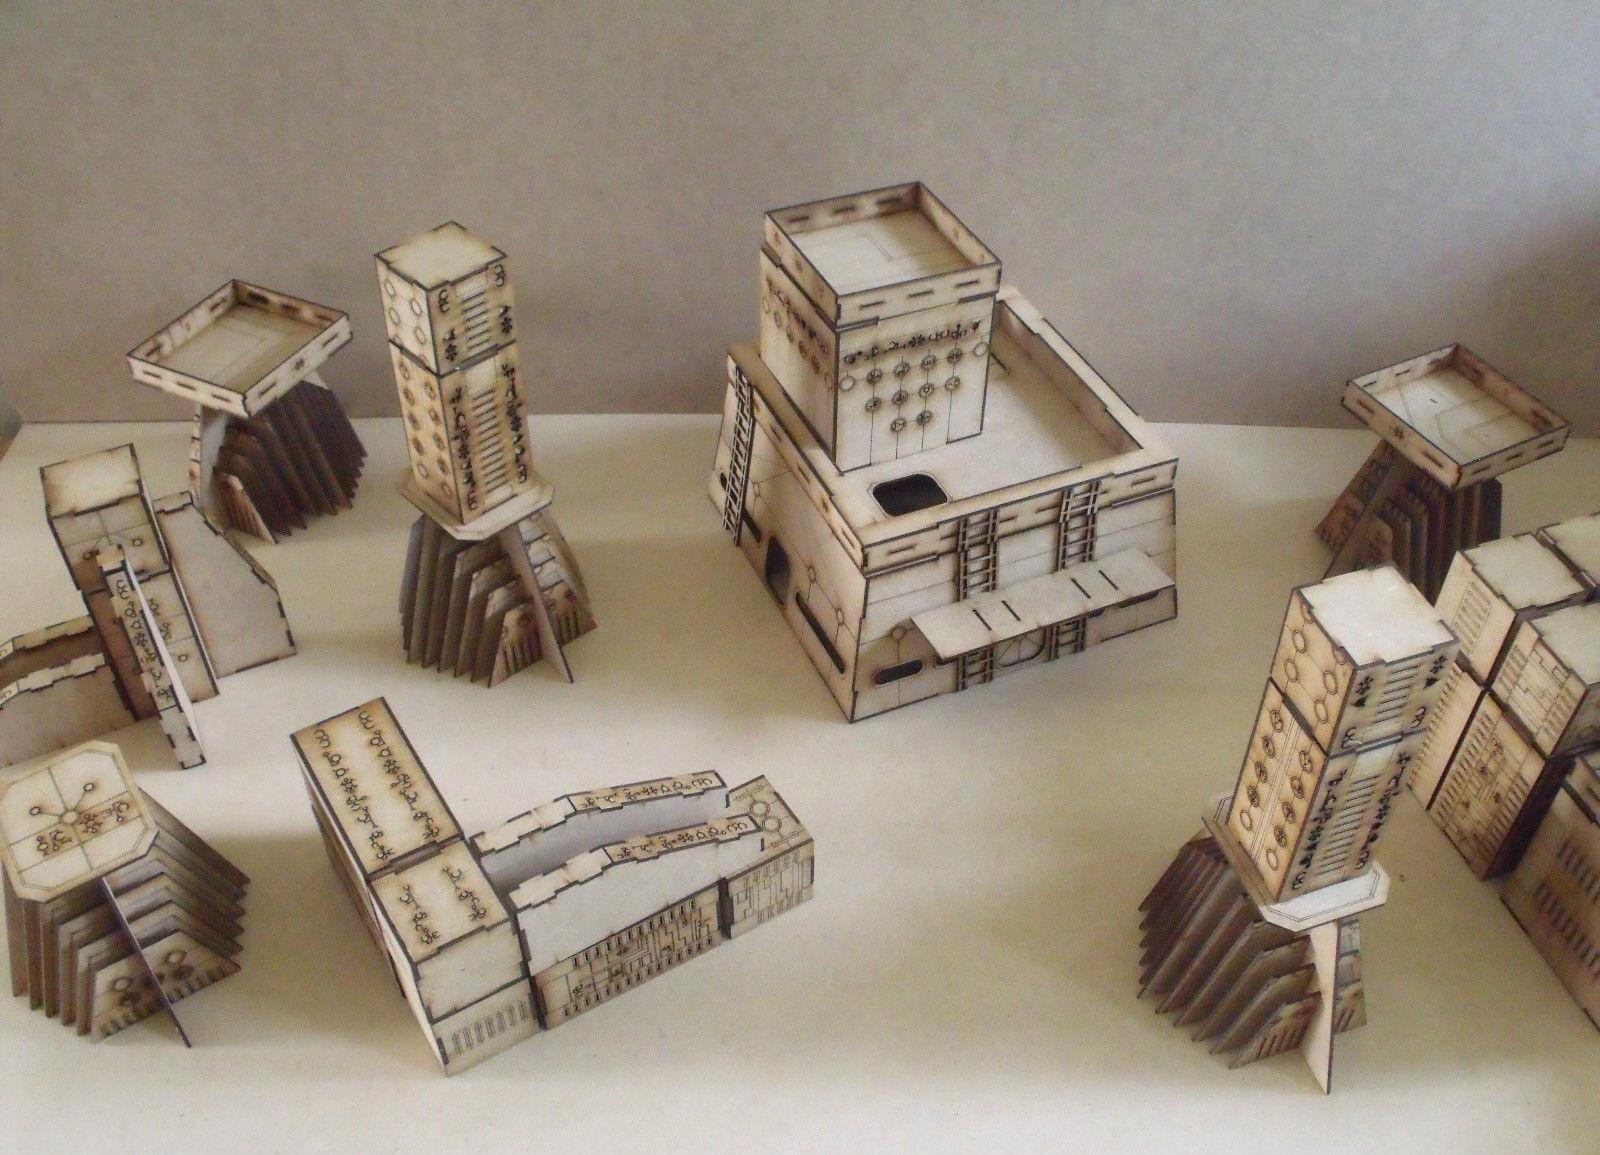 Product Review: Wargame Model Mods Laser Cut Terrain | Talk